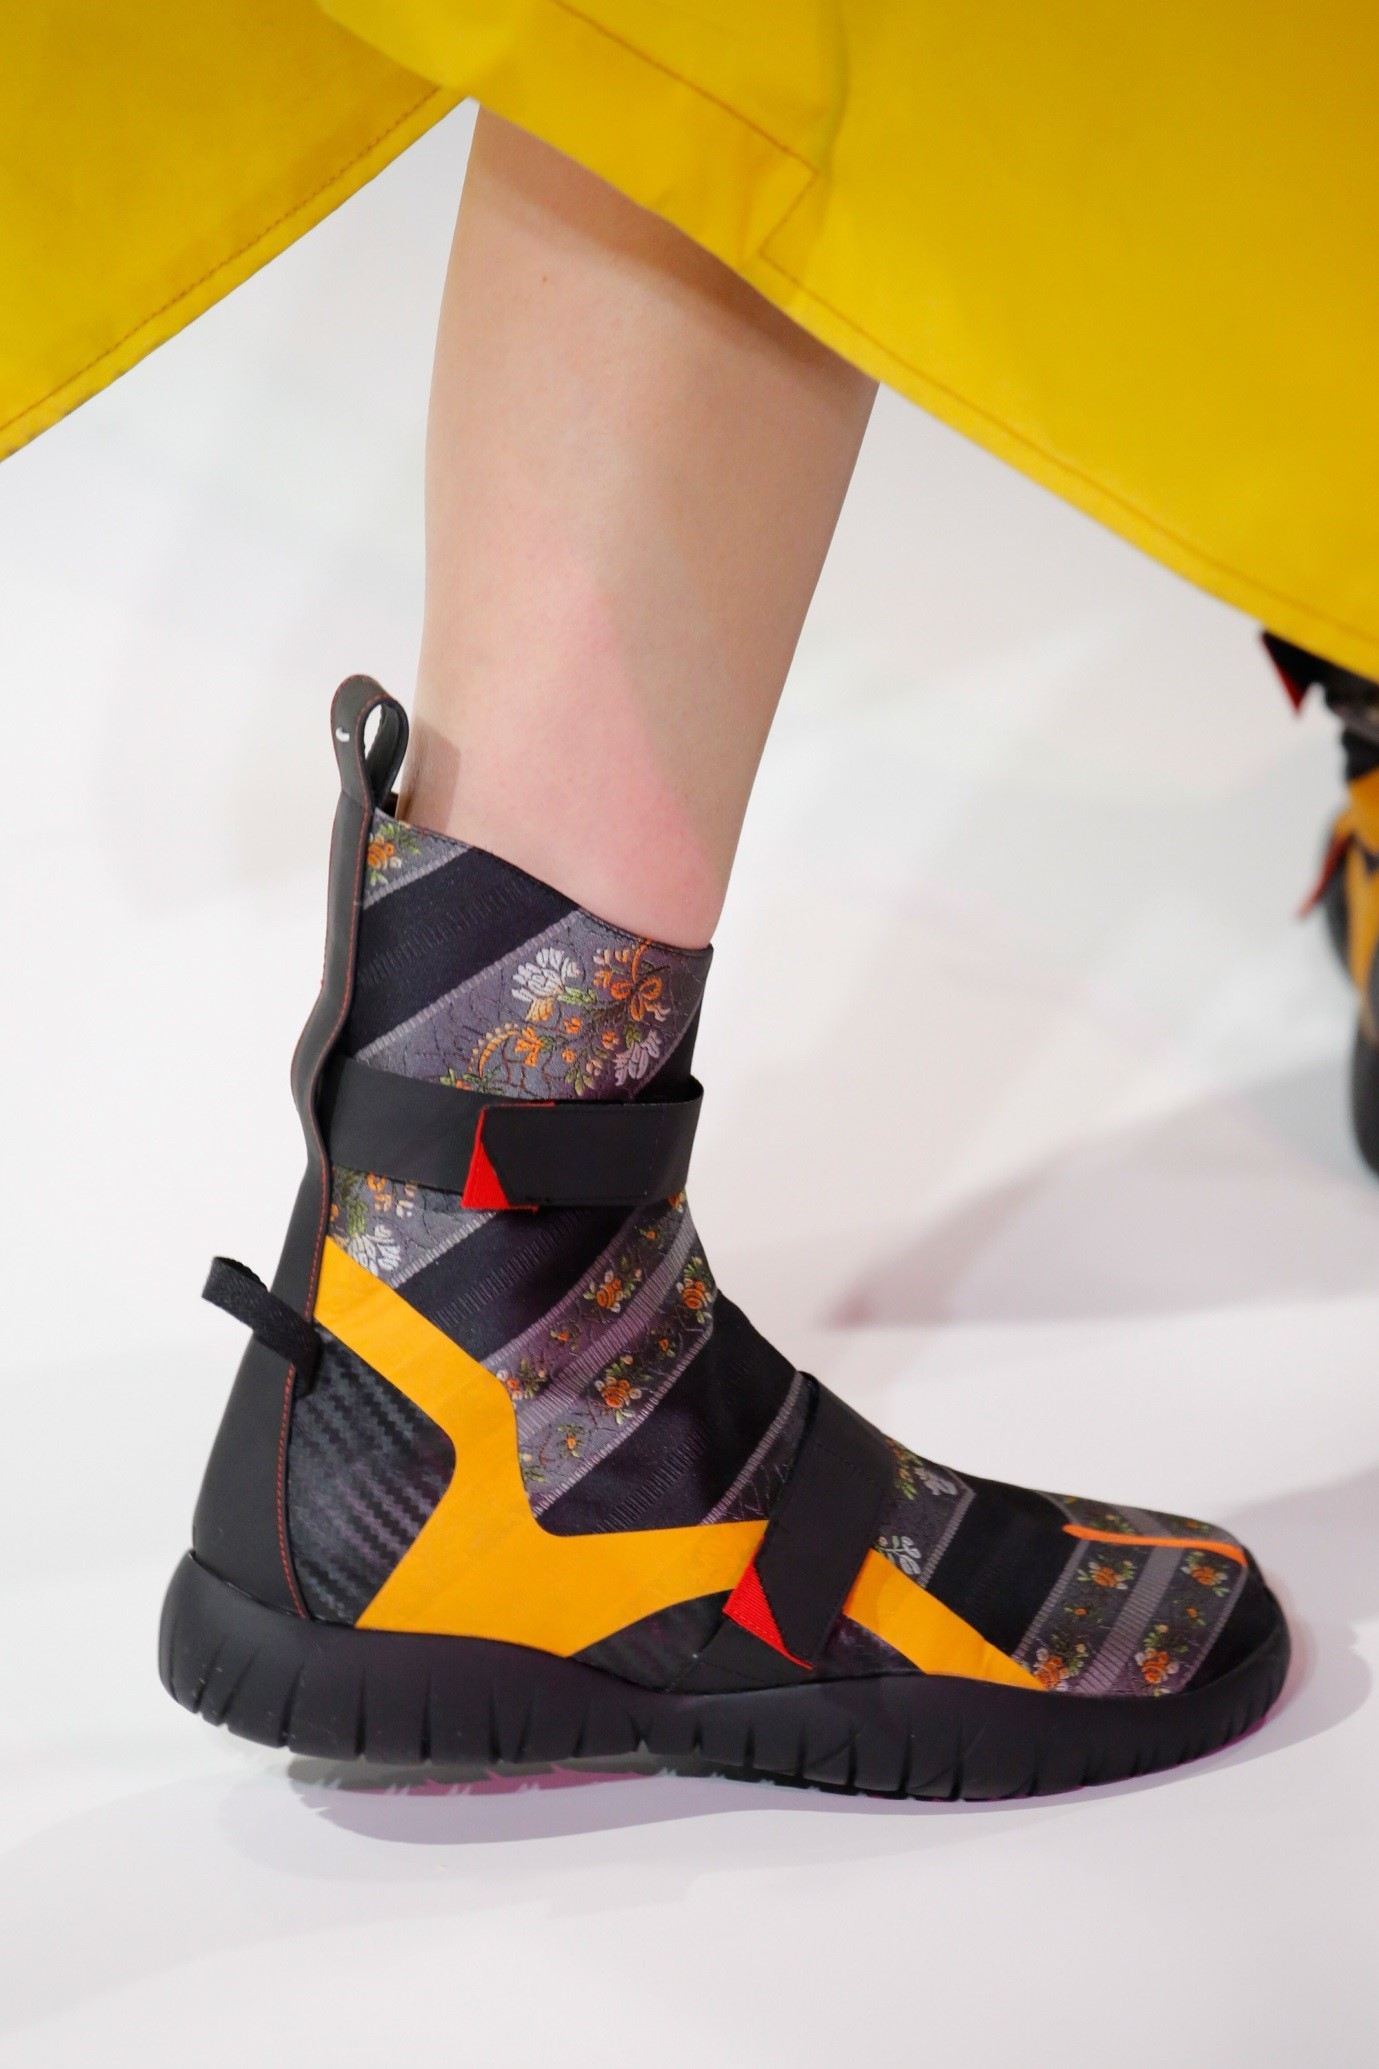 Maison Margiela(メゾンマルジェラ)スニーカーブーツ